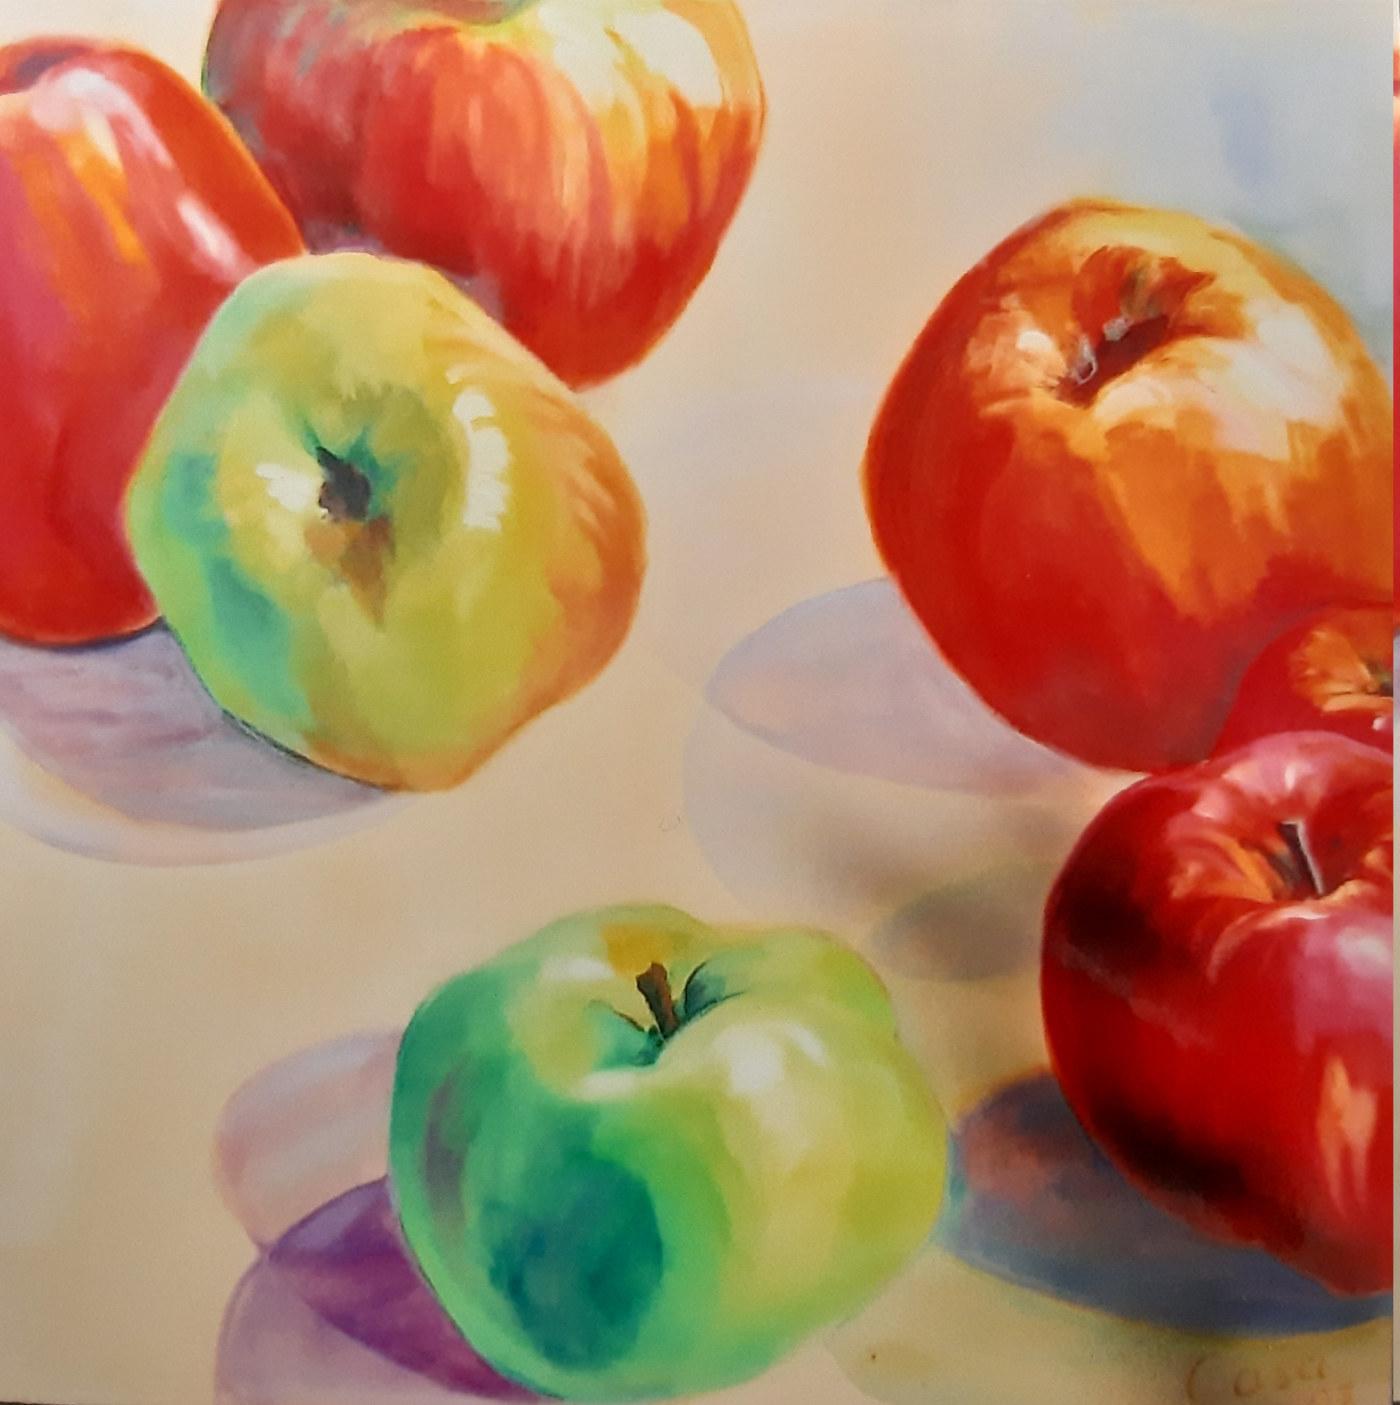 Äpfel im Angebot - Acryl auf Leinwand - 100 x 100 cm